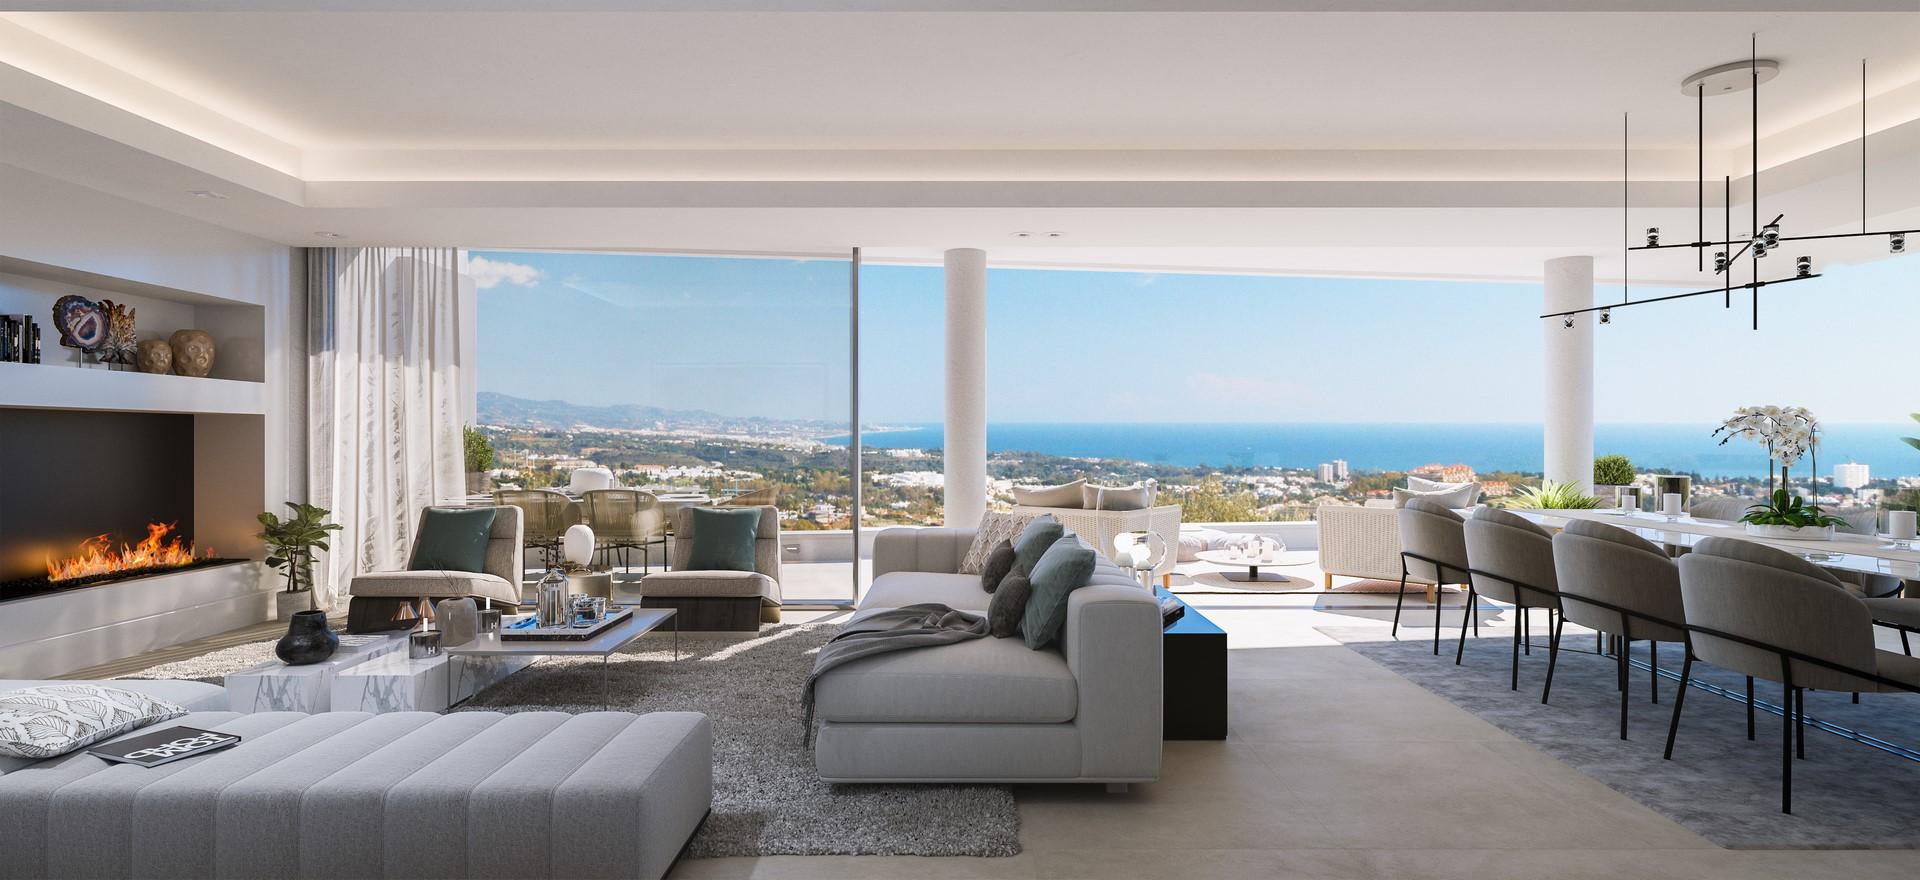 Luxury apartment (11)